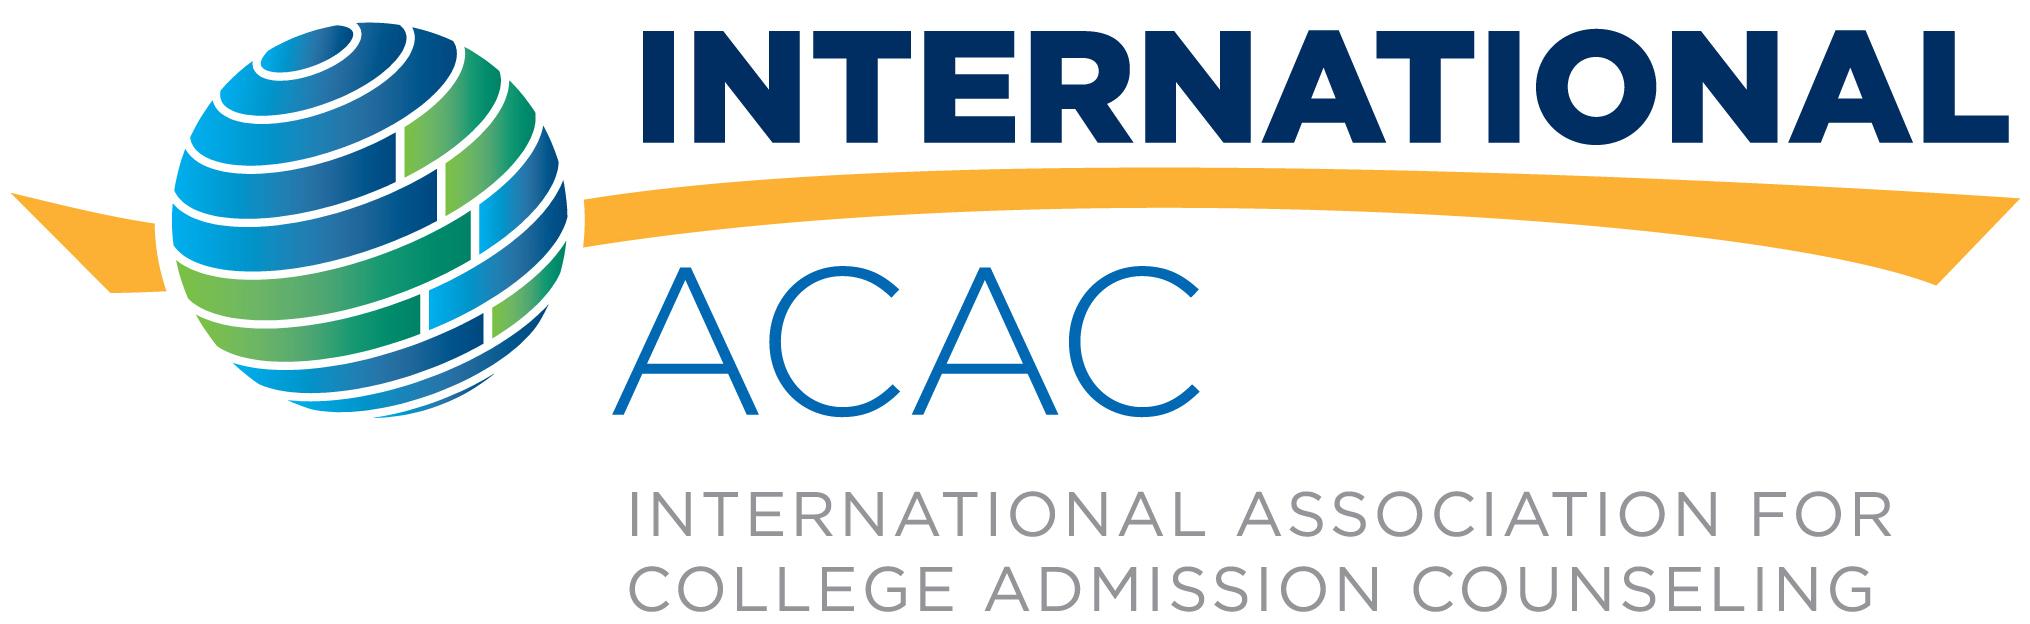 International ACAC Logo